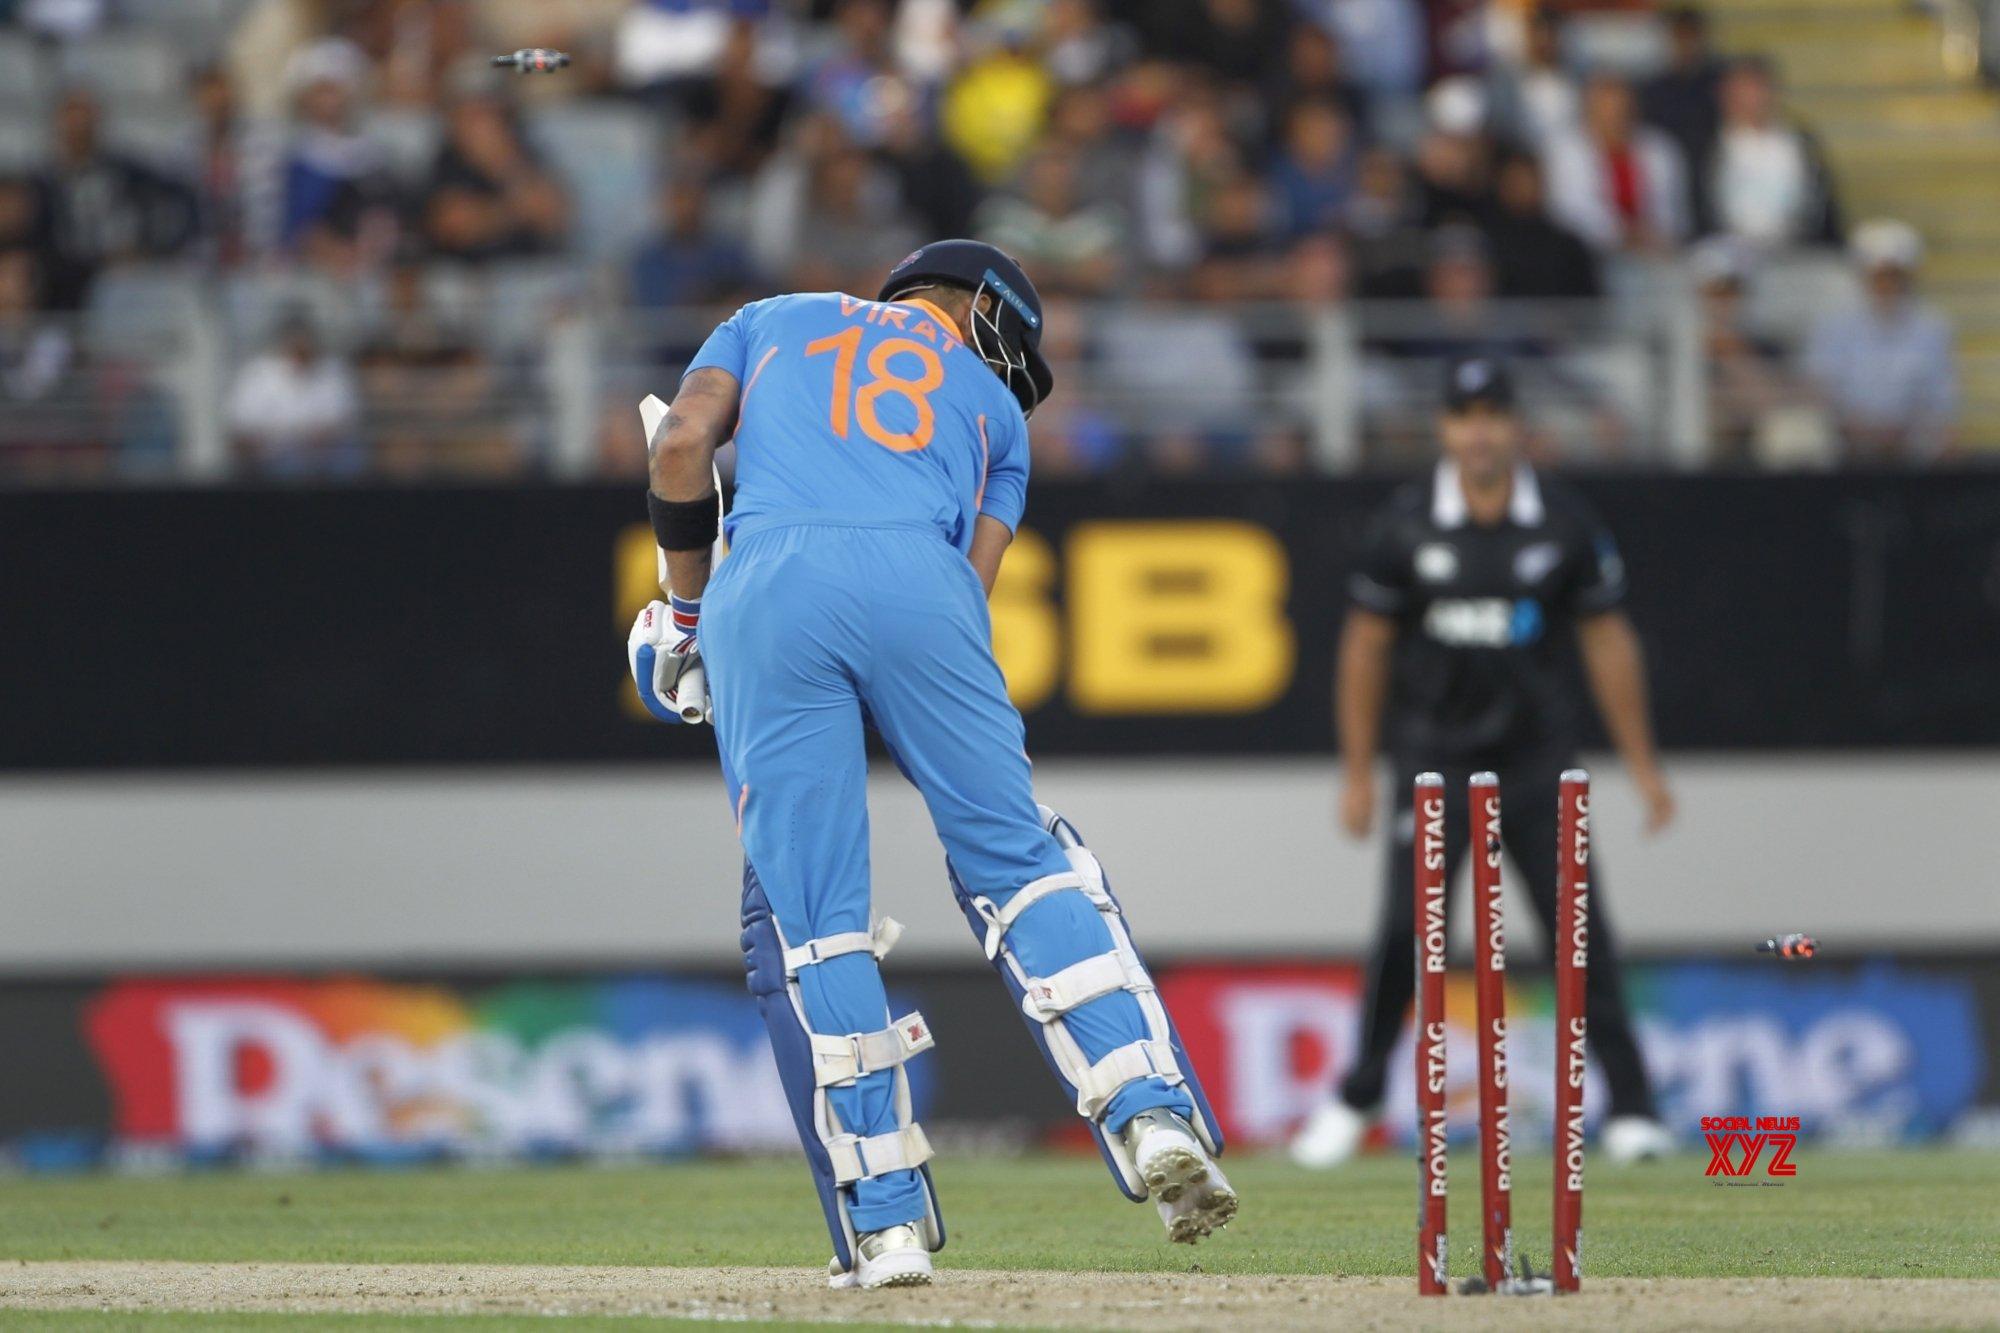 Auckland: 2nd ODI - India Vs New Zealand (Batch - 9) #Gallery